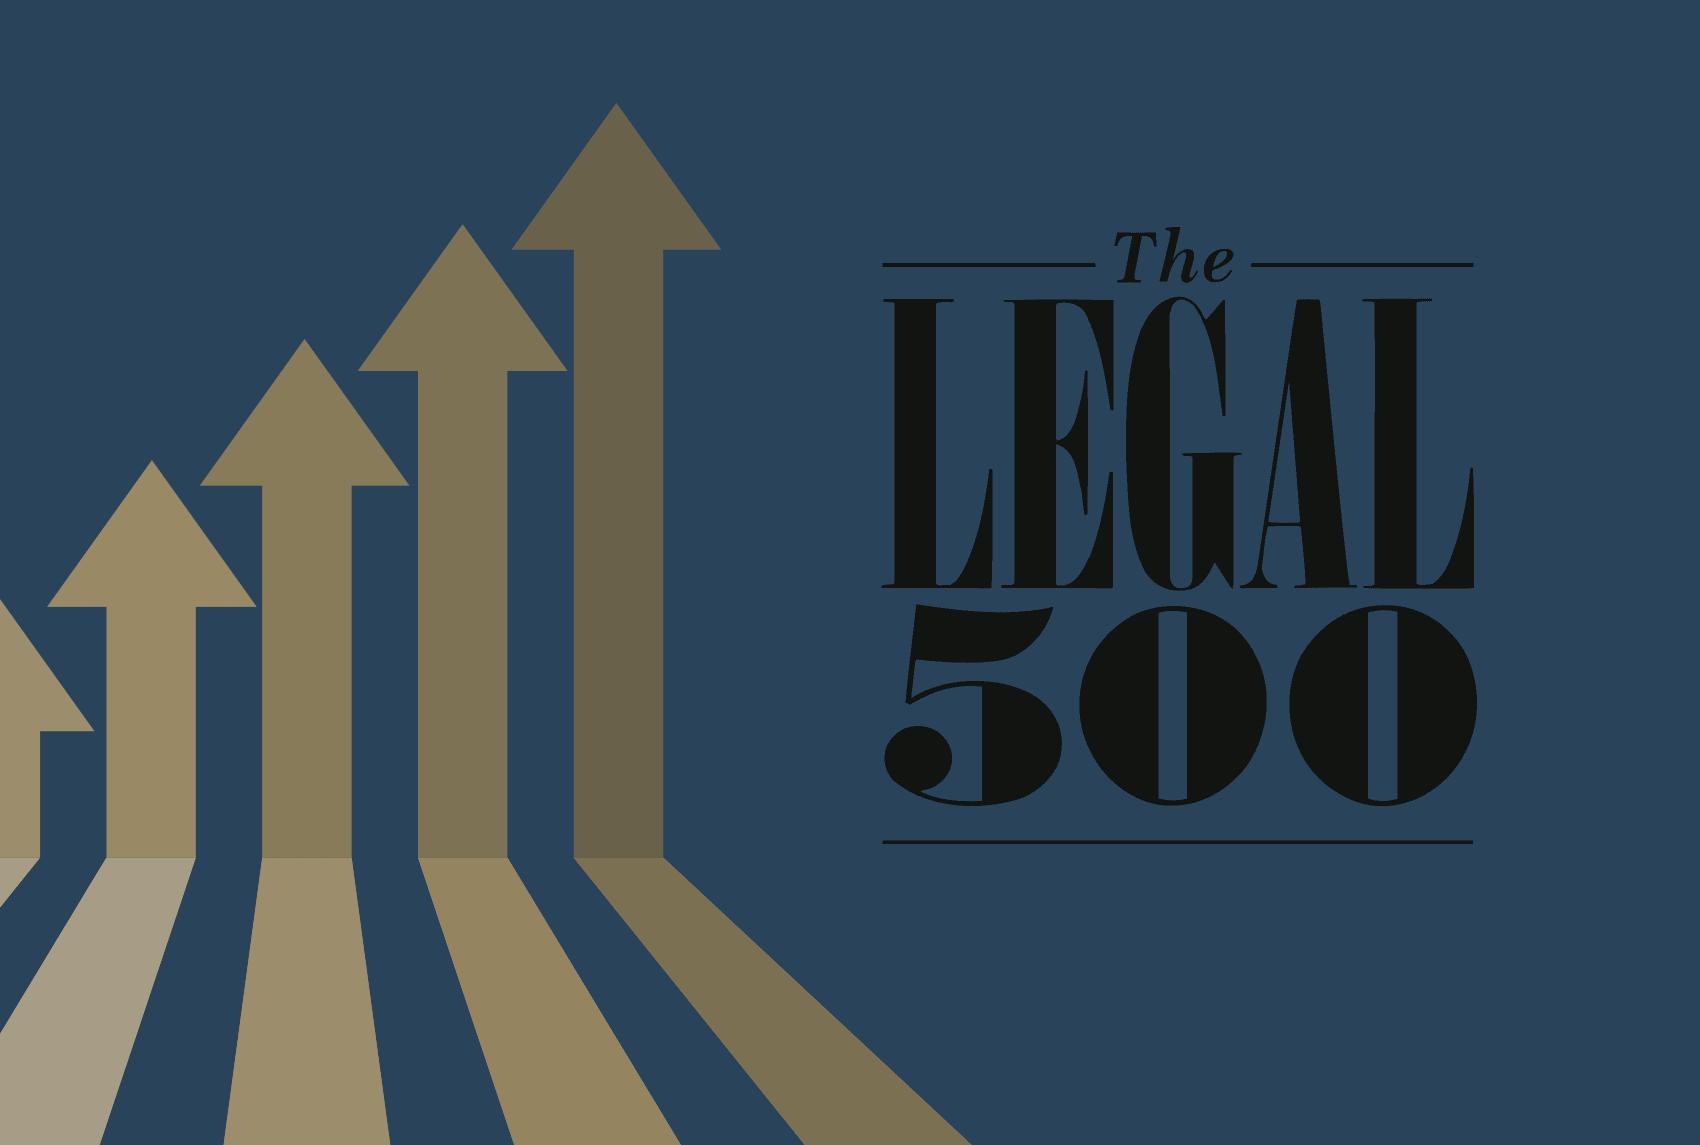 The Legal 500 EMEA 2021 rankings released